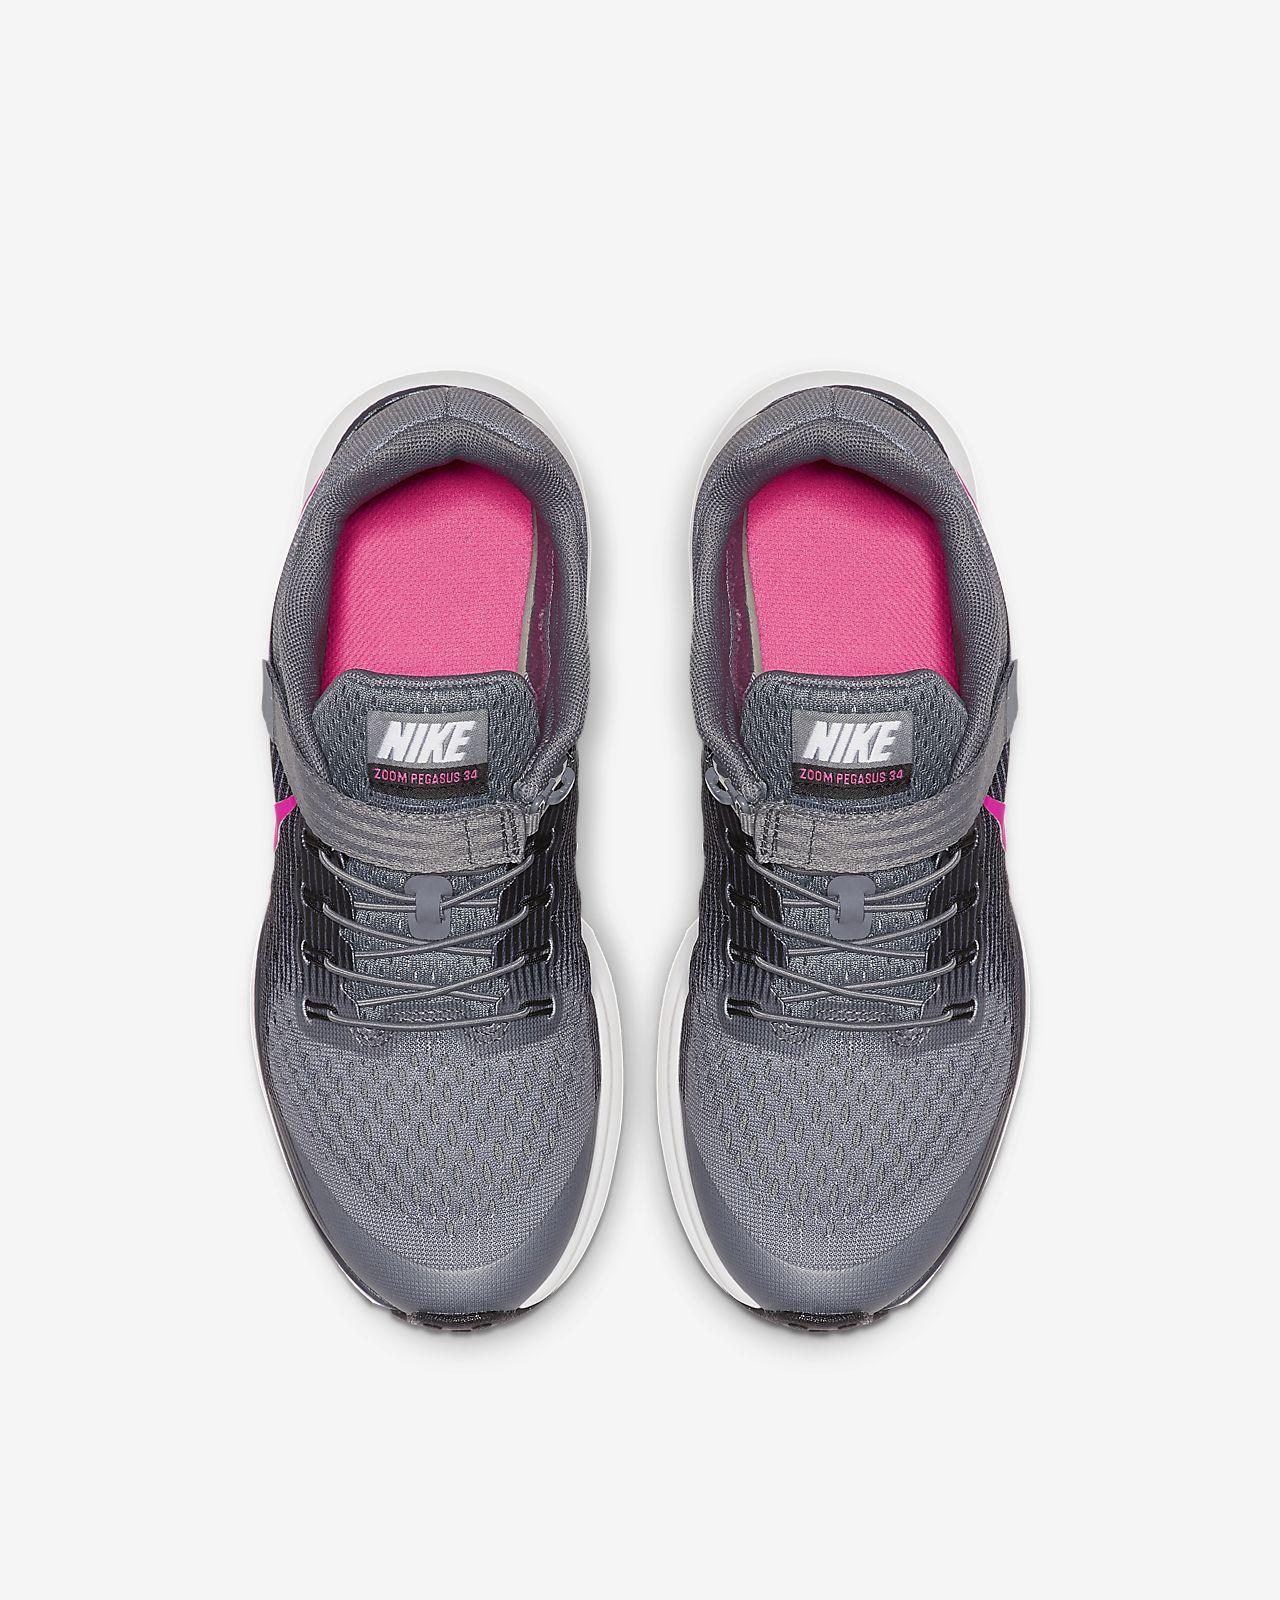 scarpe nike bambino bianche 34